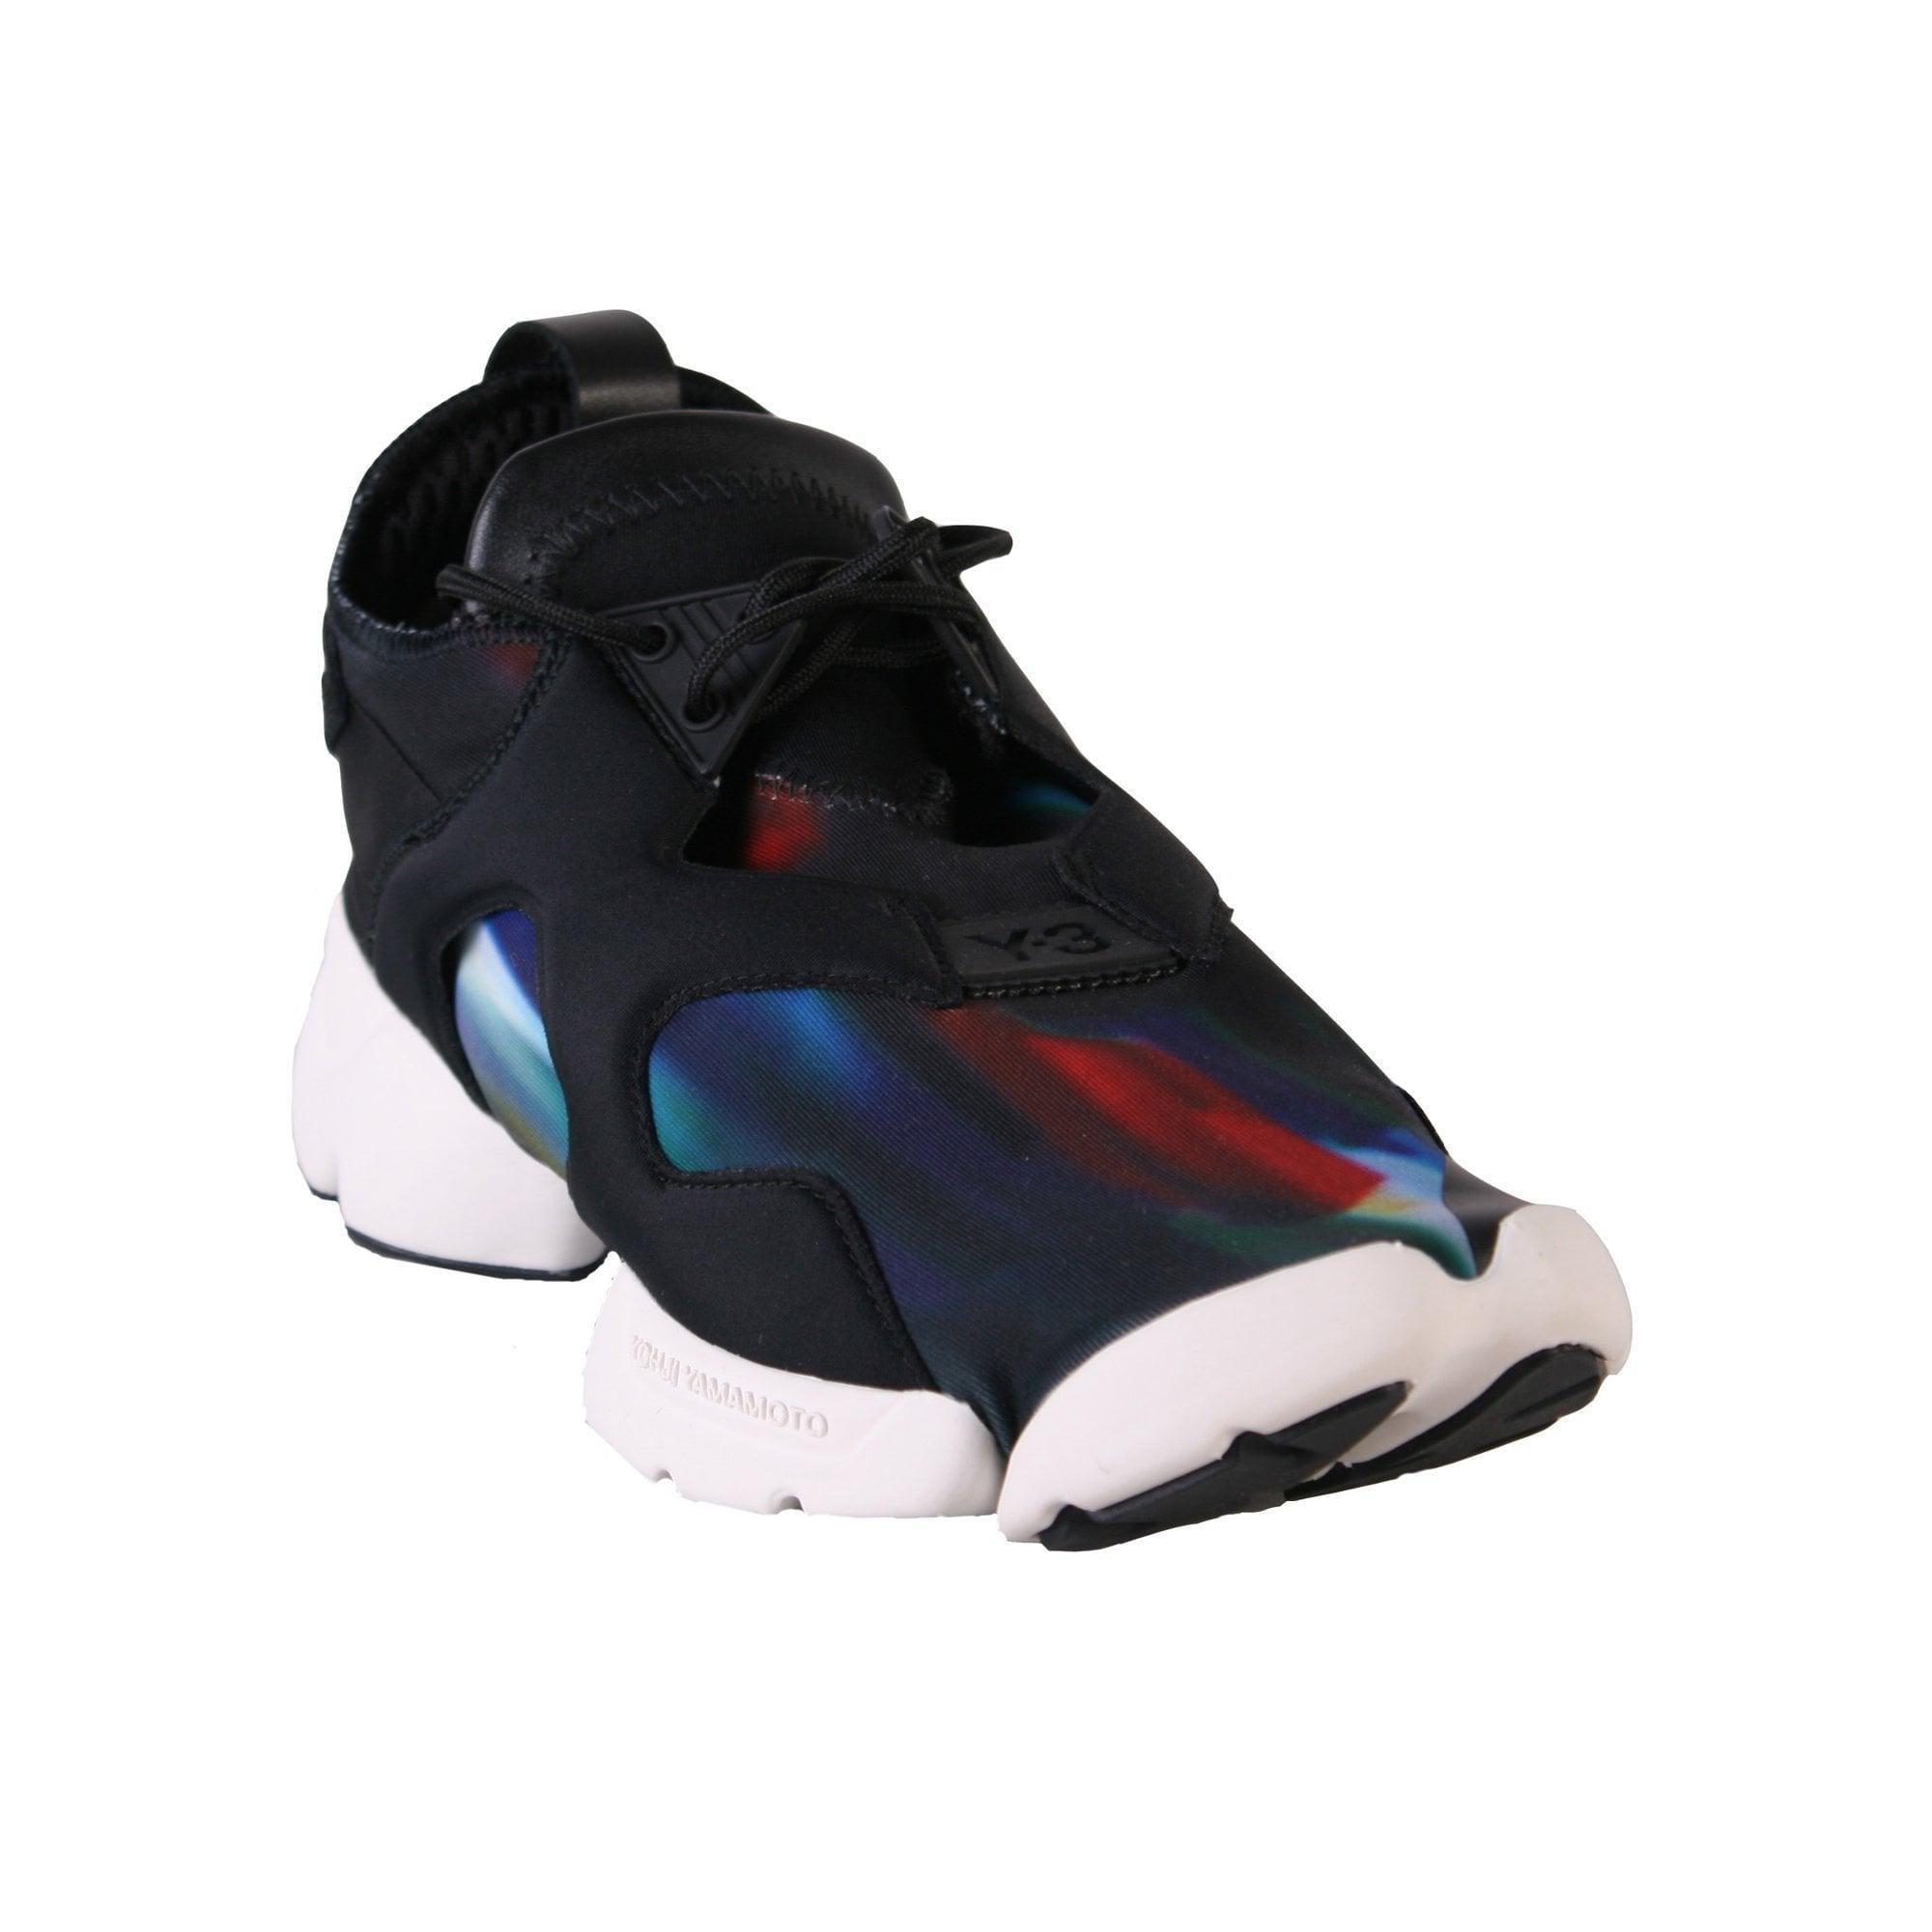 ef93bdc5bb87e Y-3 Y-3 Kohna Sneakers in Black for Men - Lyst